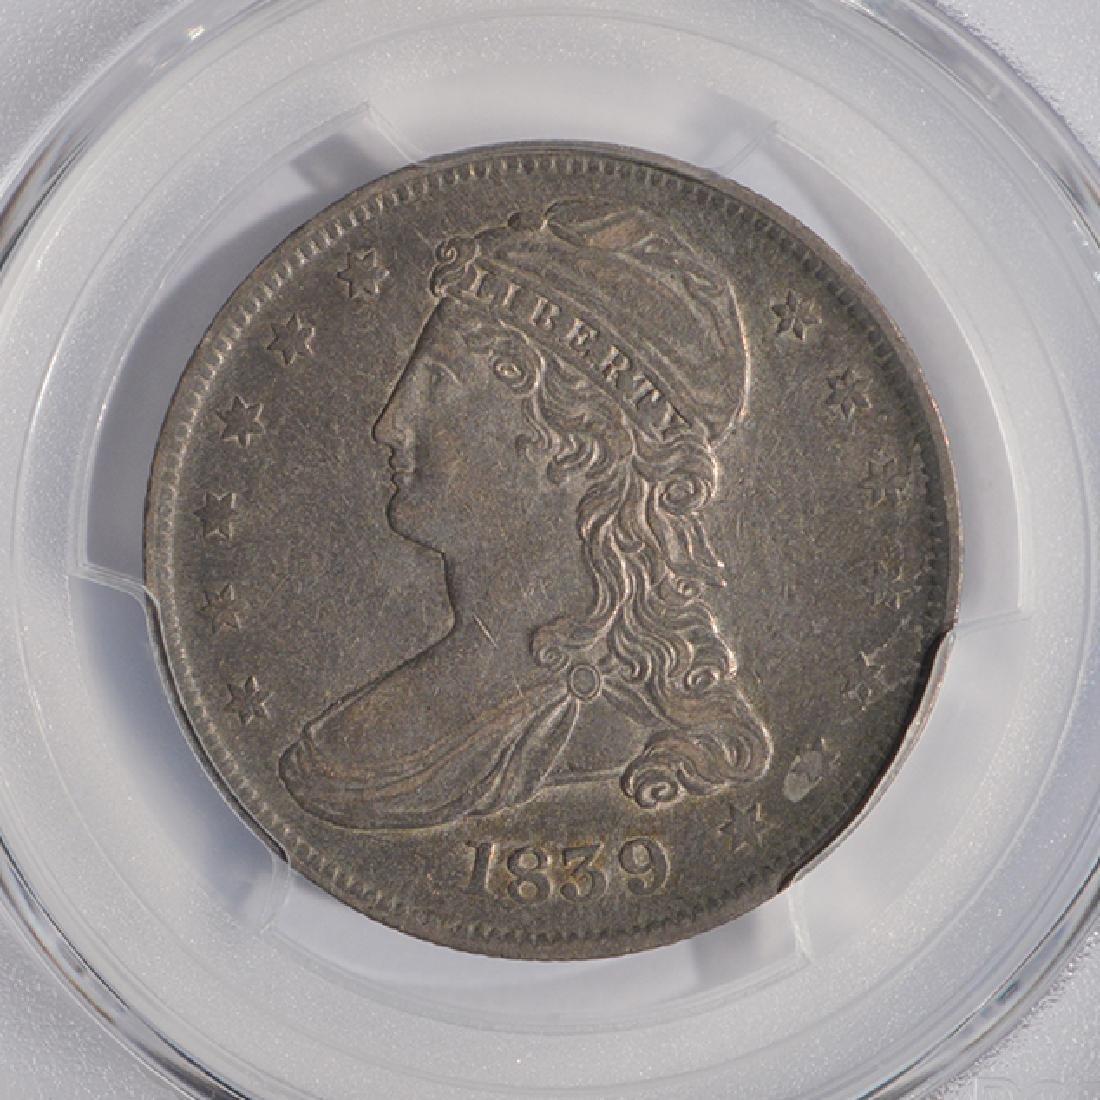 1839 Capped Bust Half Dollar Coin PCGS XF45 - 3